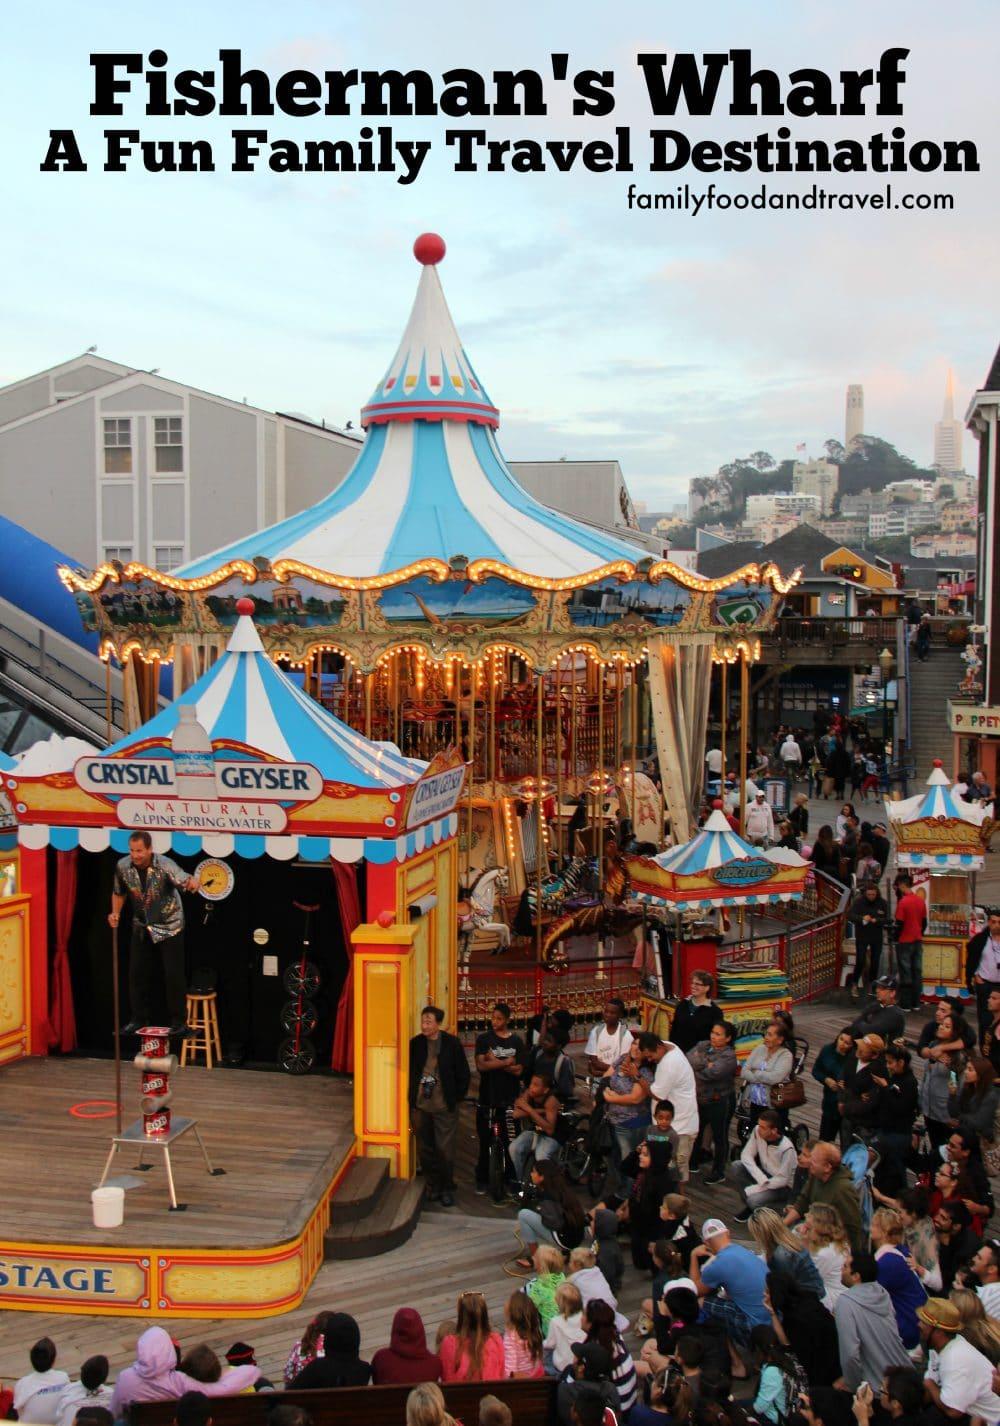 Visit Fisherman's Wharf as a Fun Family Travel Destination